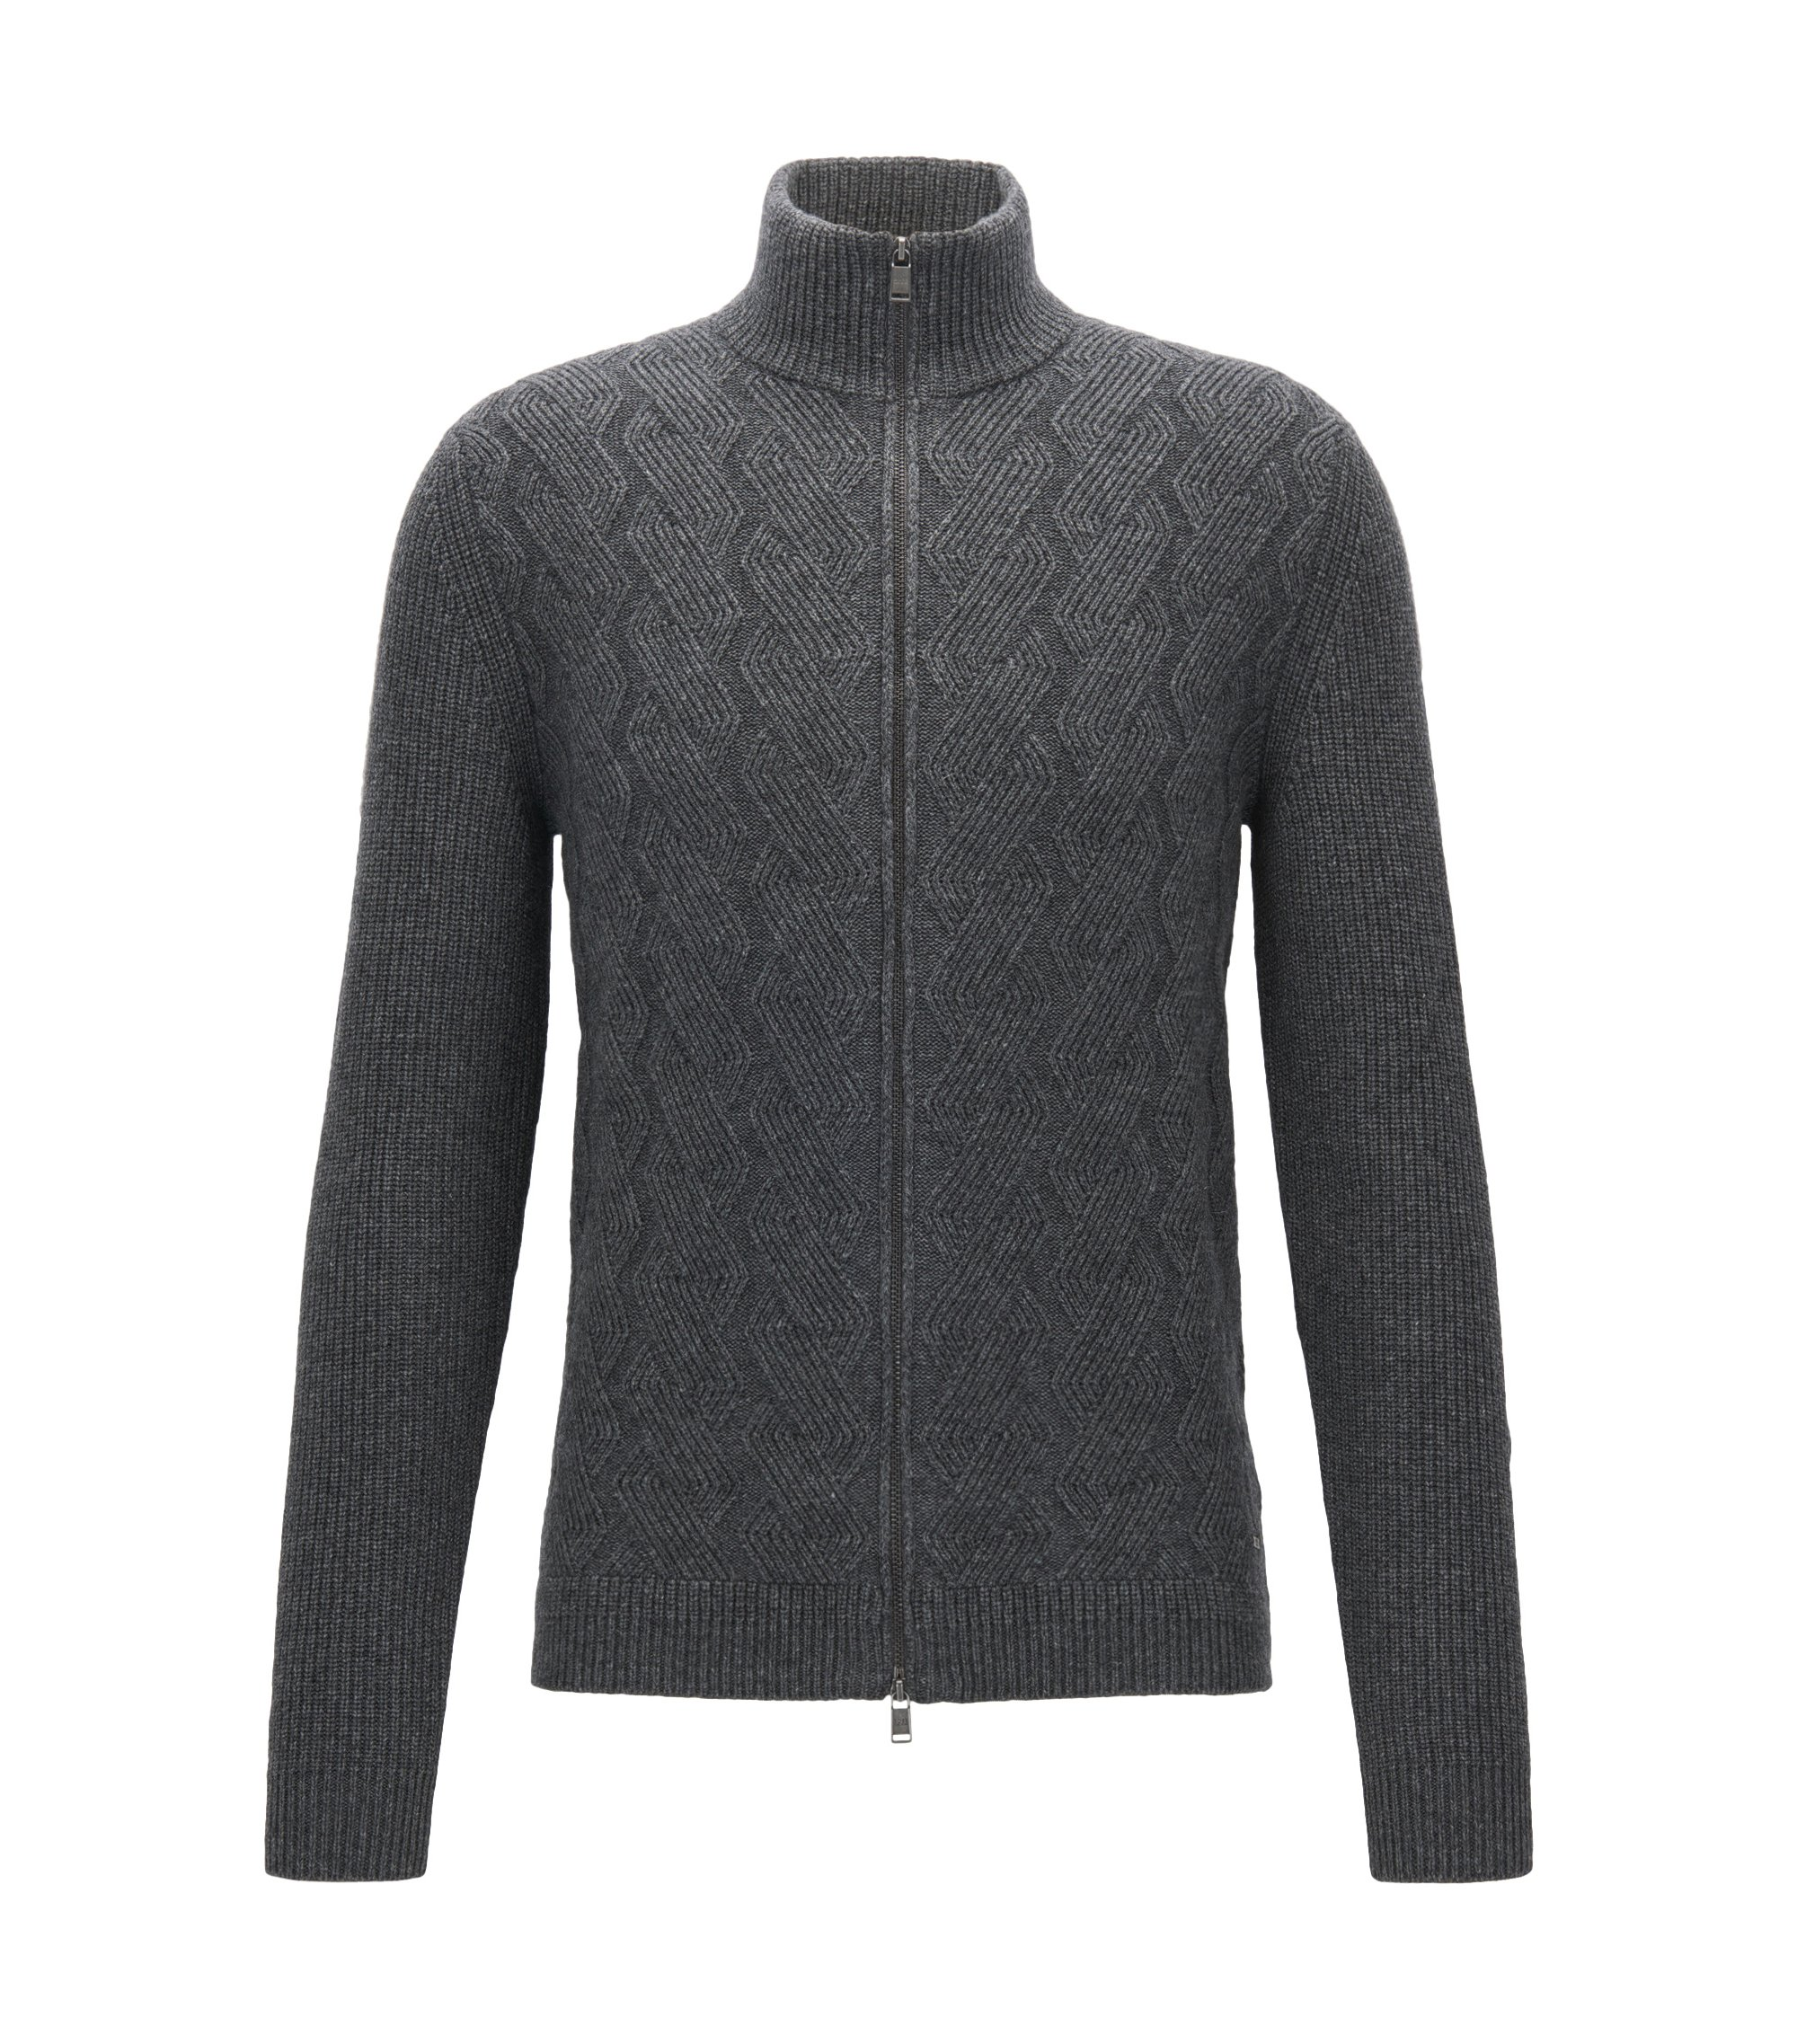 Virgin Wool Luxury Blend Full-Zip Cardigan | Naik, Grey